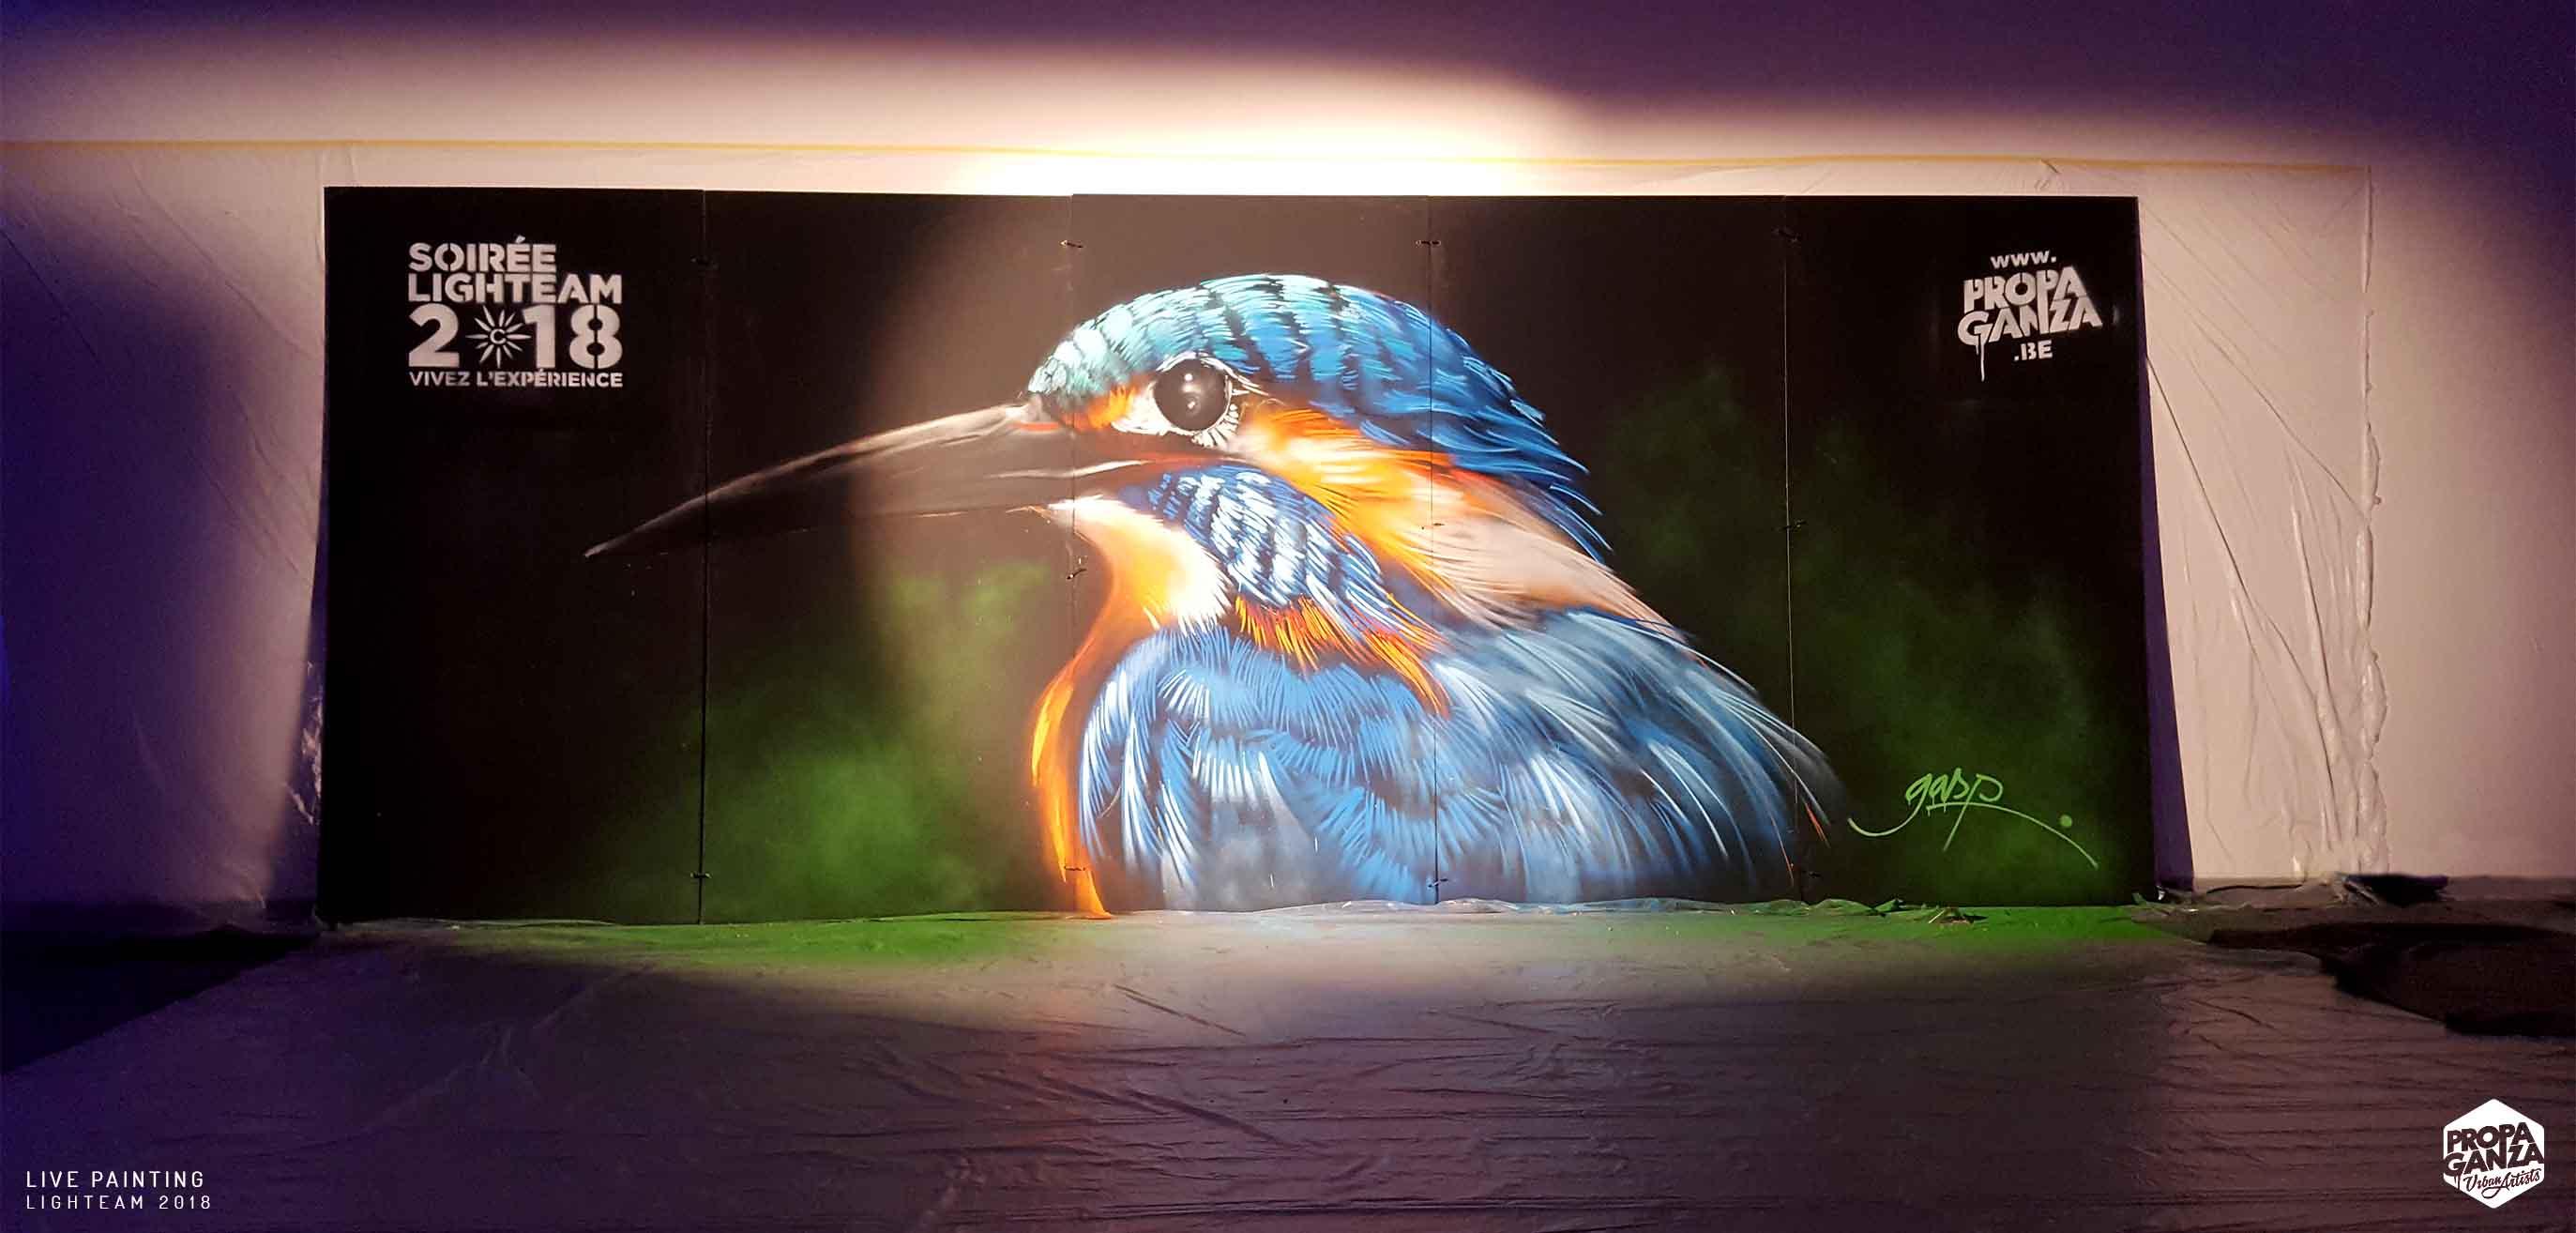 https://www.propaganza.be/wp-content/uploads/2019/04/propaganza-artistes-graffiti-street-art-bruxelles-belgique-belgium-painting-spraycan-spraypaint-fresque-2018-gasp.jpg